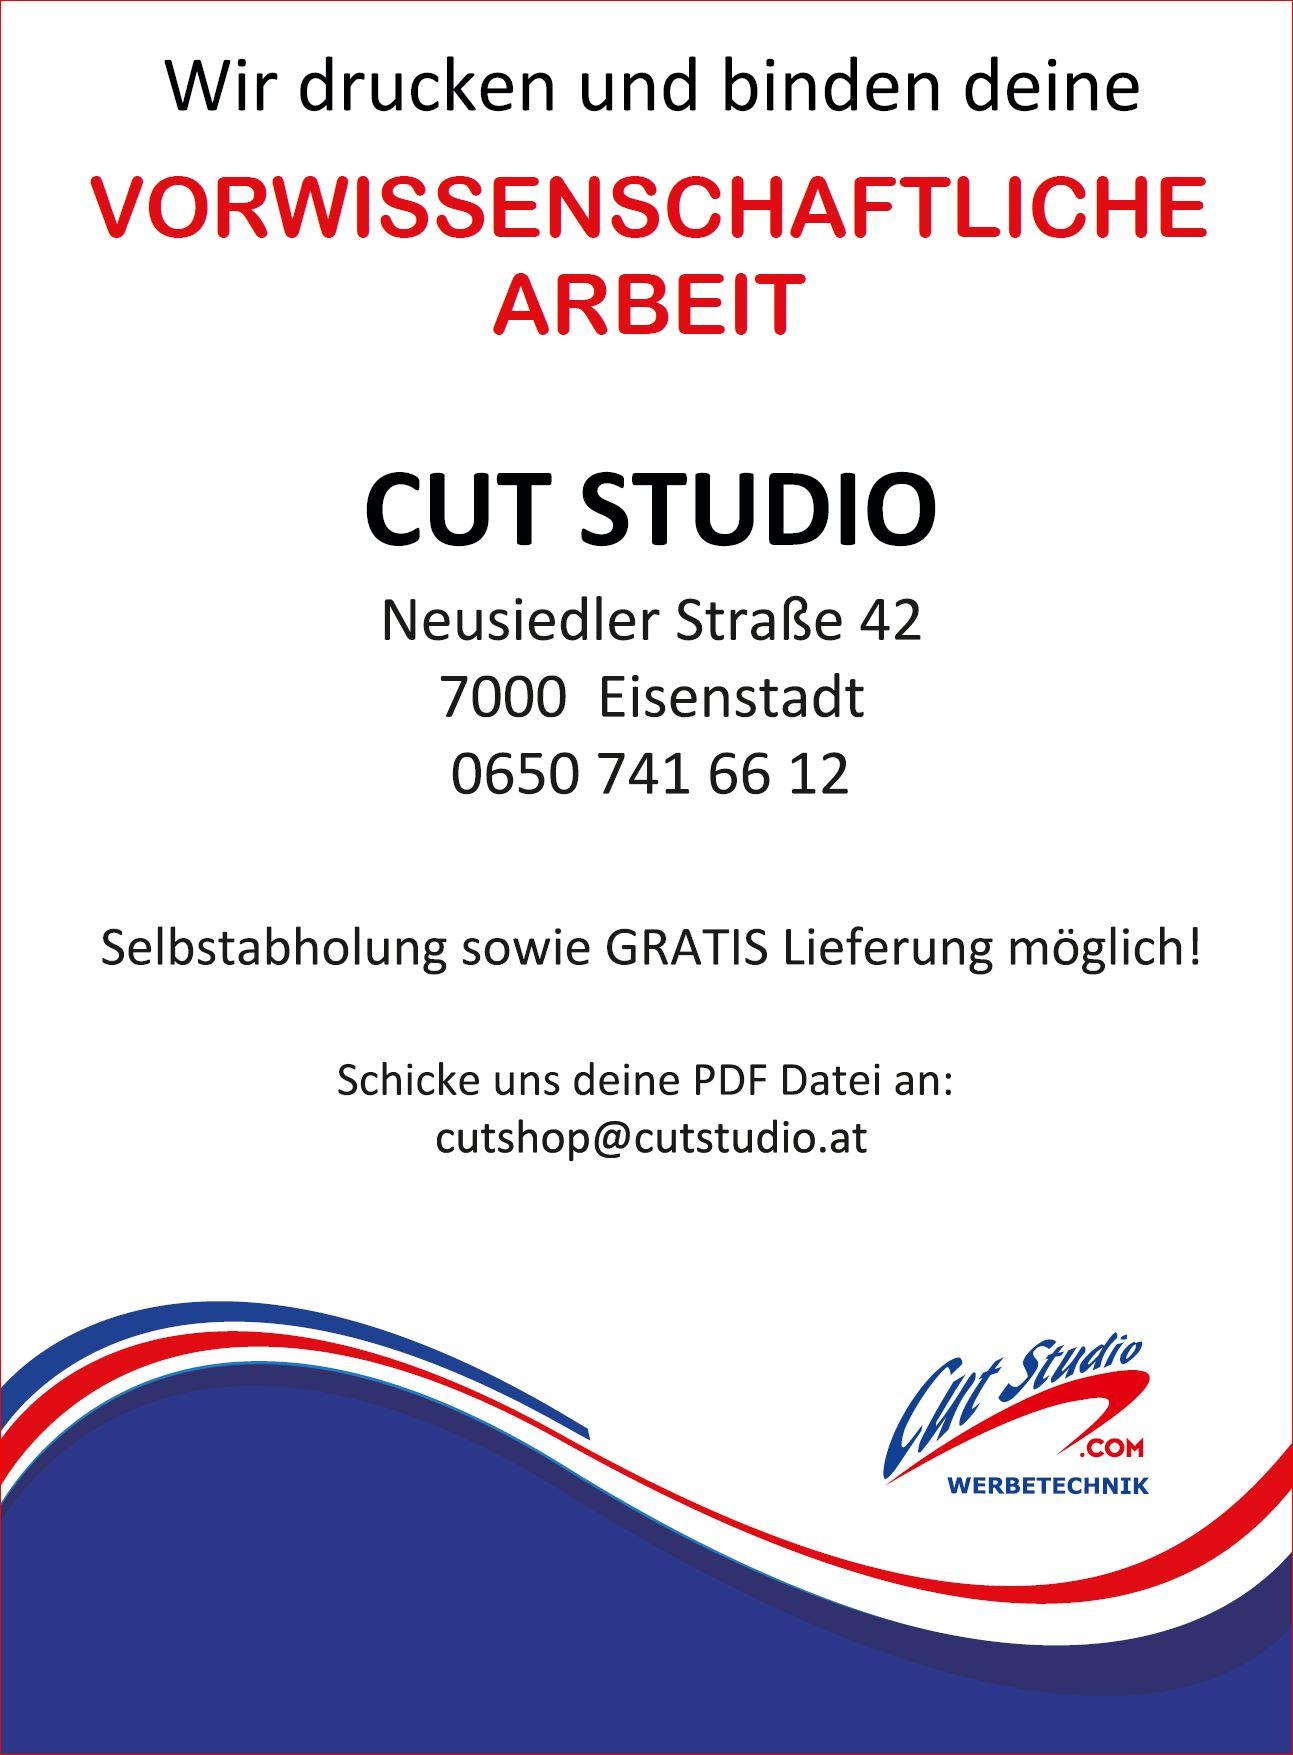 Cut Studio Werbetechnik 7000 Eisenstadt